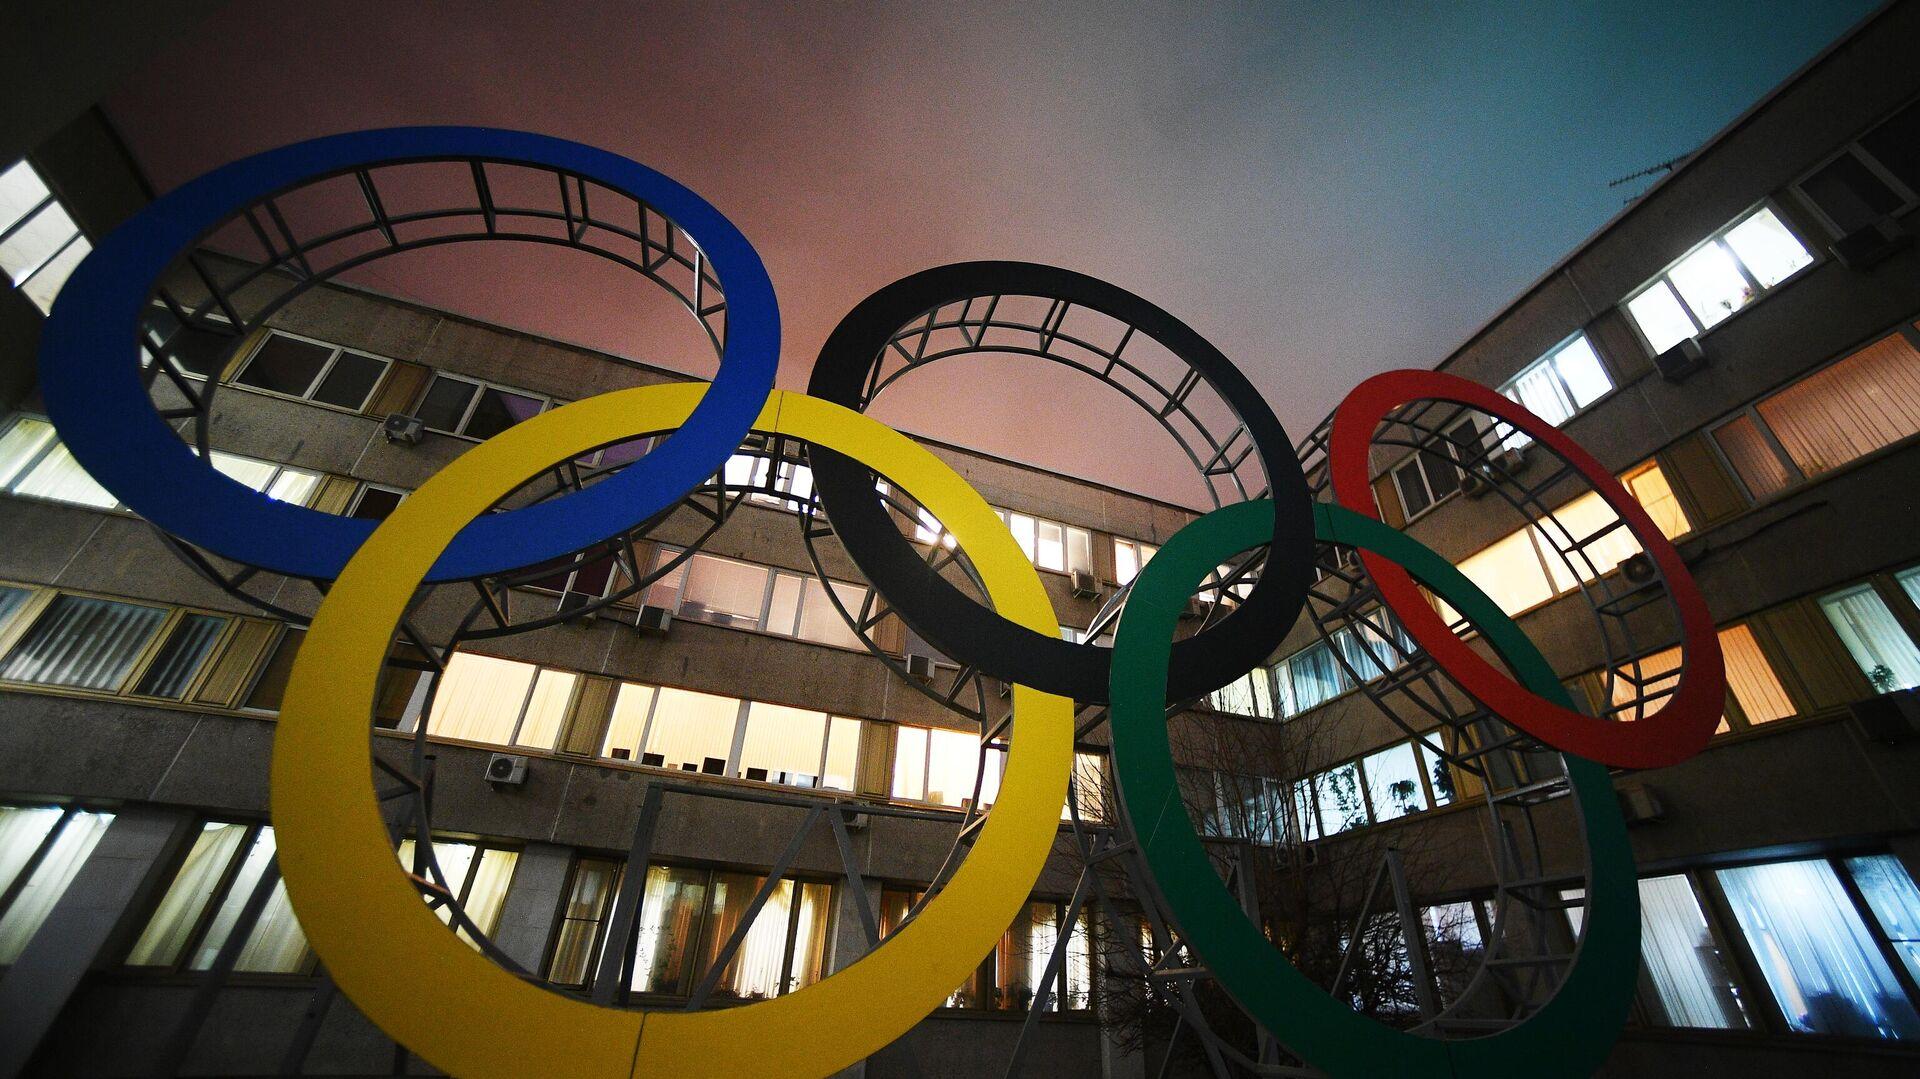 Олимпийские кольца во дворе здания Олимпийского комитета России - РИА Новости, 1920, 04.09.2020